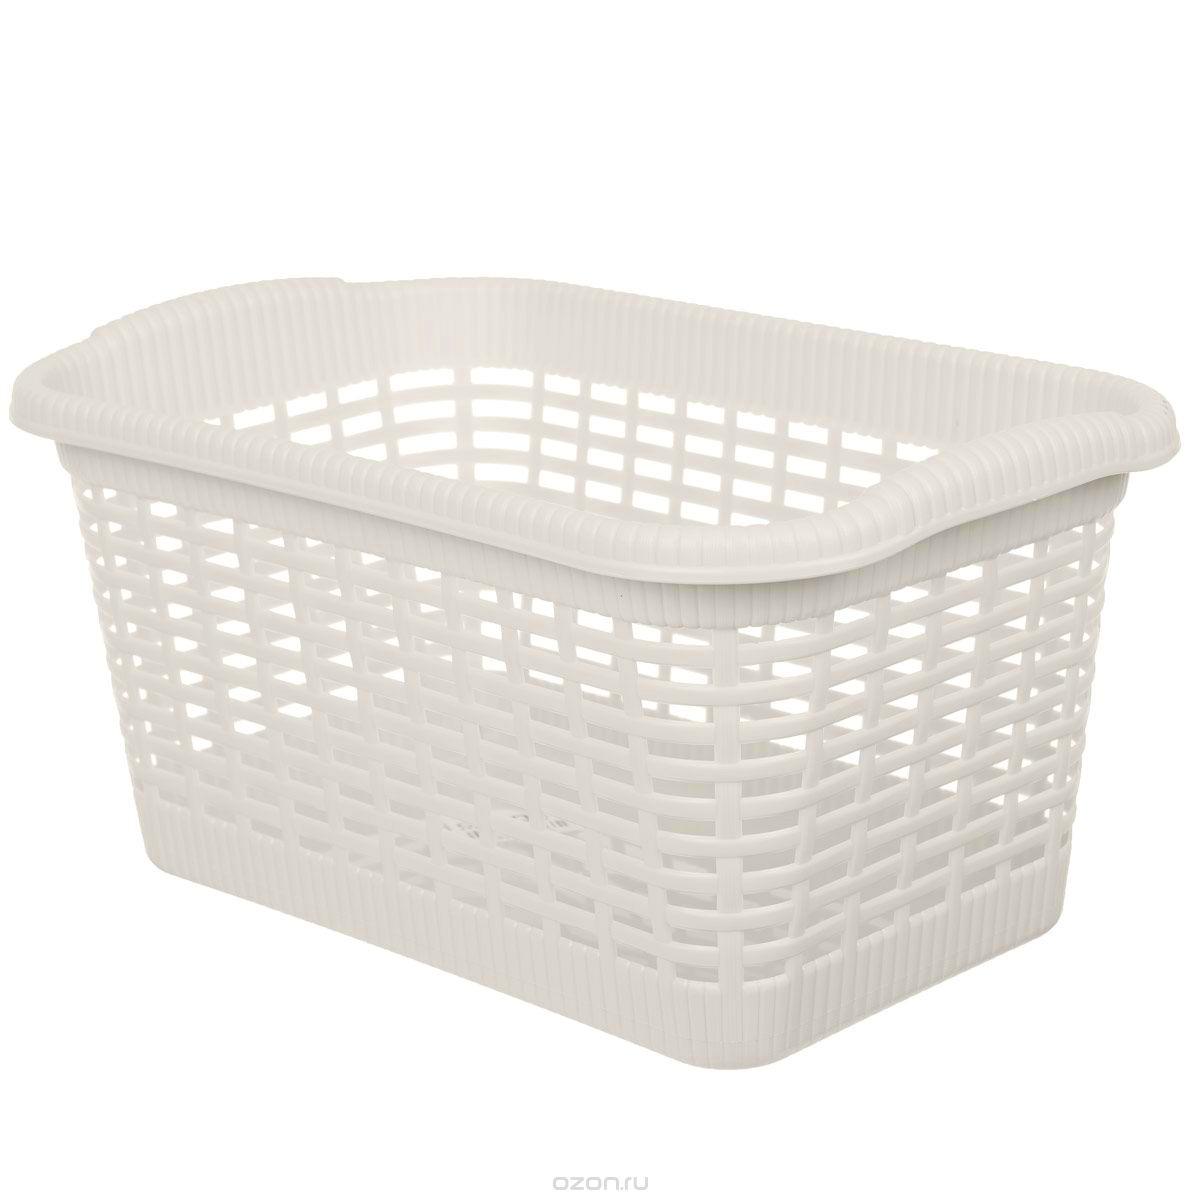 Корзина хозяйственная Gensini, цвет: светло-бежевый, 36 x 22,5 x 18 см корзина складная outwell folding basket цвет зеленый 50 x 29 x 25 см